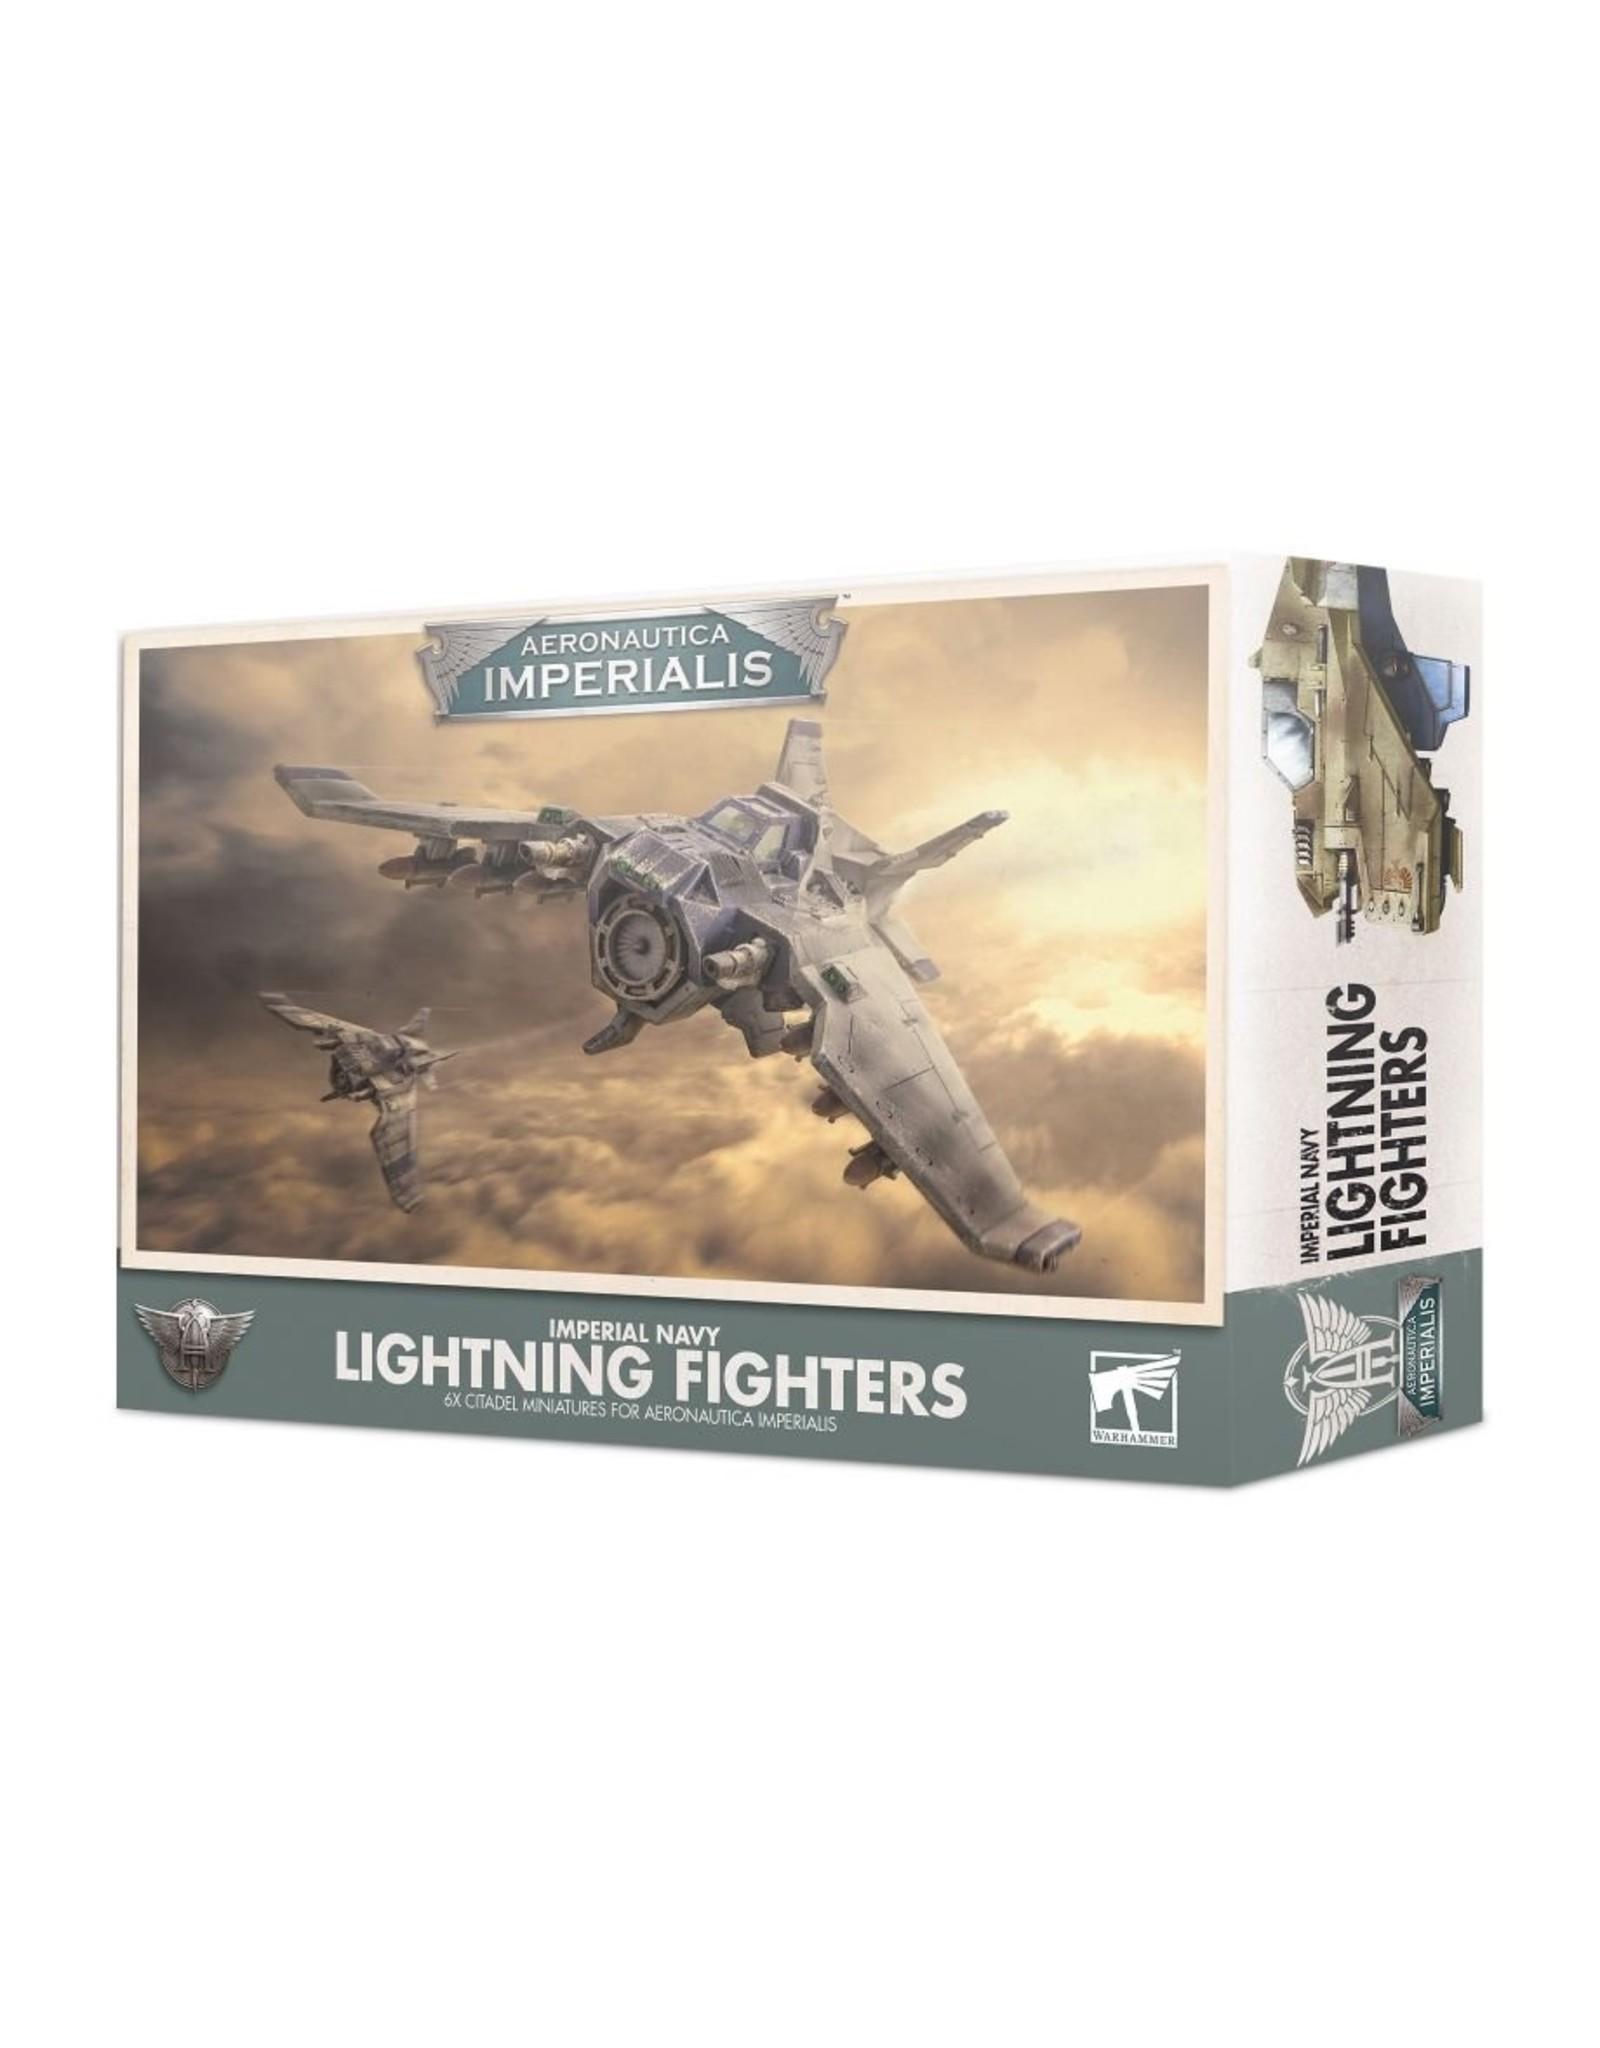 Games Workshop Aero/Imperialis: Imperial Navy Lightning Fighters